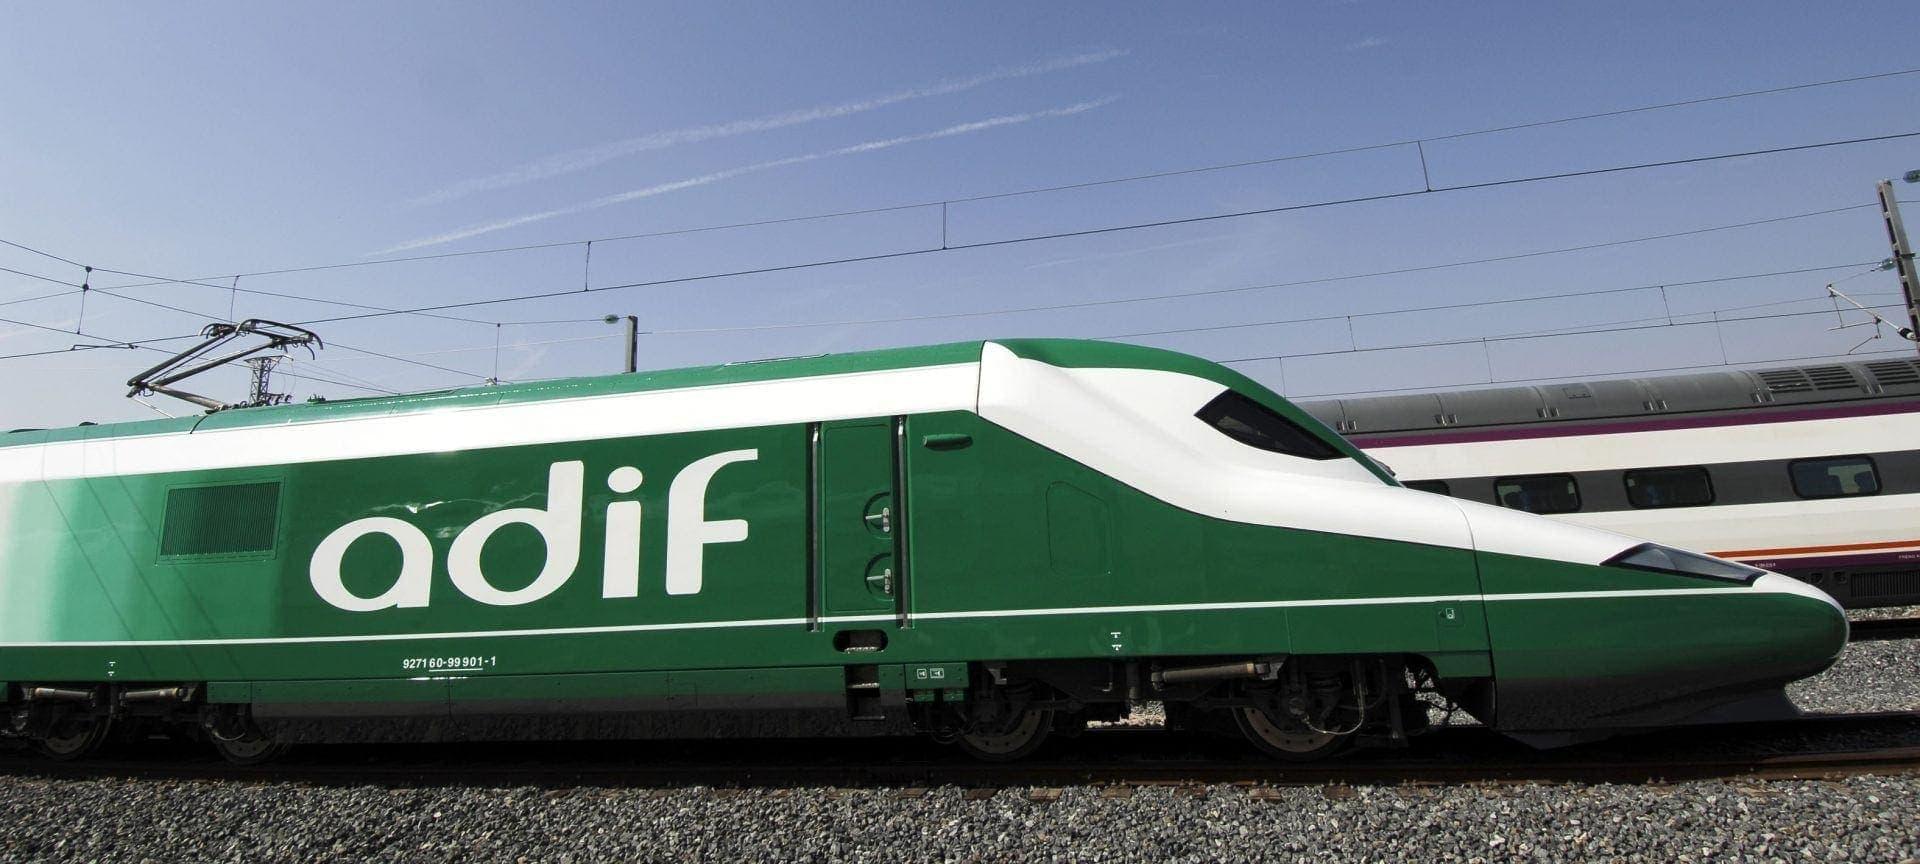 rail of the future mit adif y ferrovial